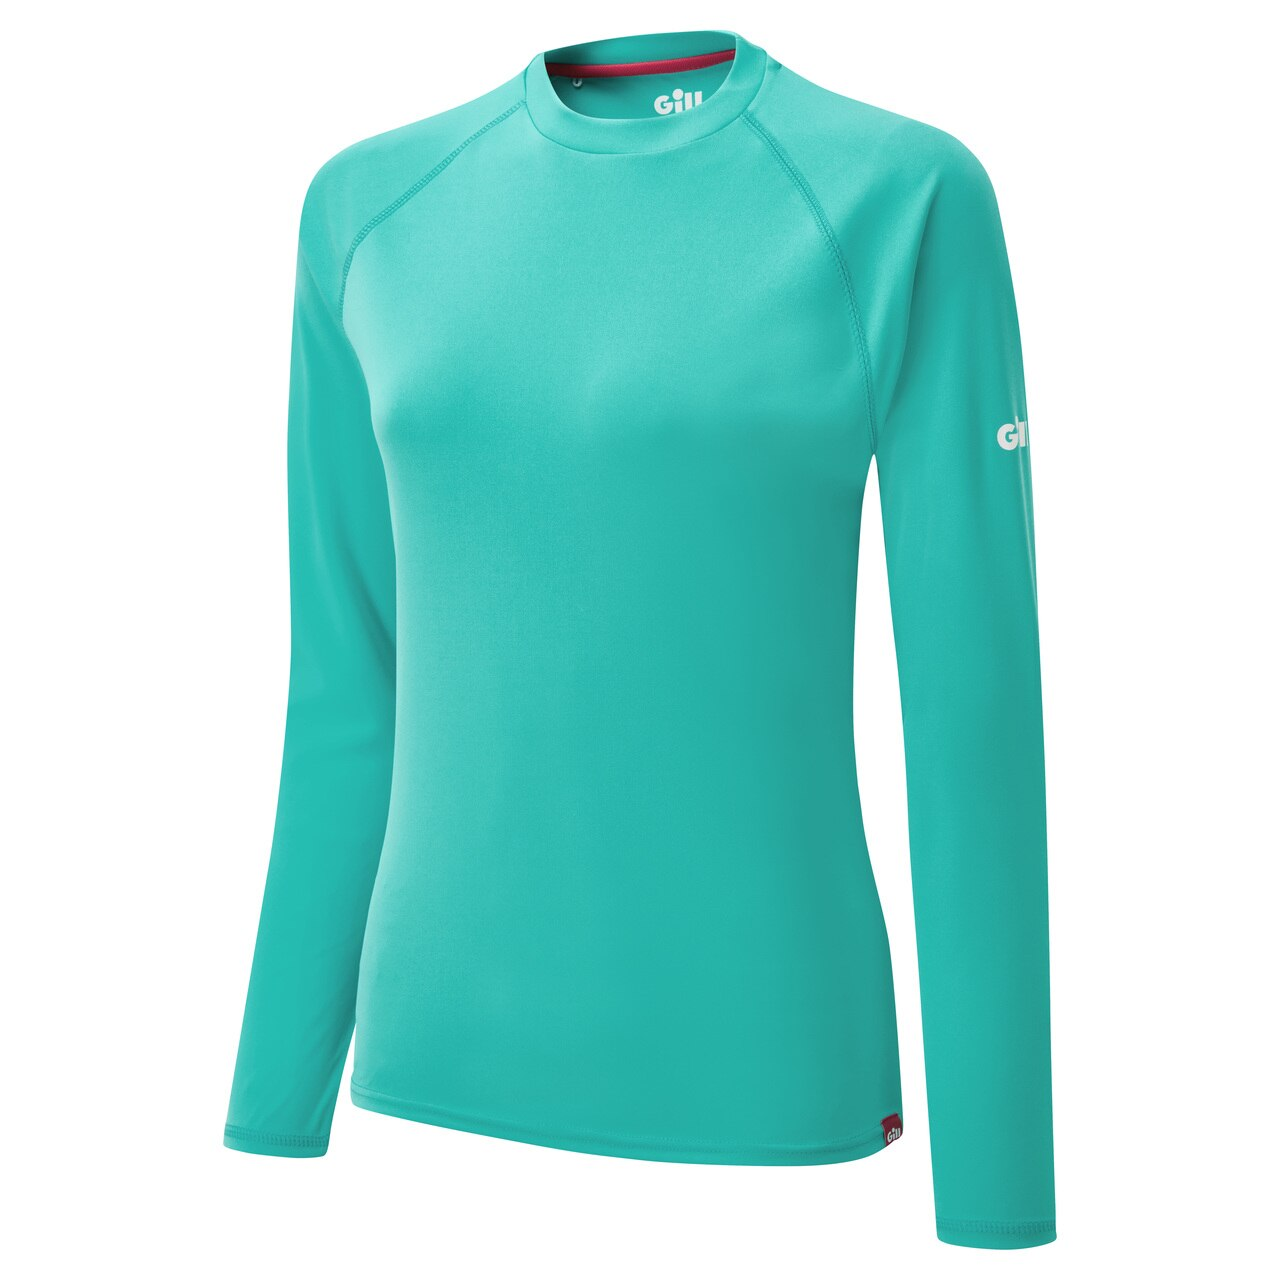 Women's UV Tec Long Sleeve Tee - UV011W-TUR02-2.jpg